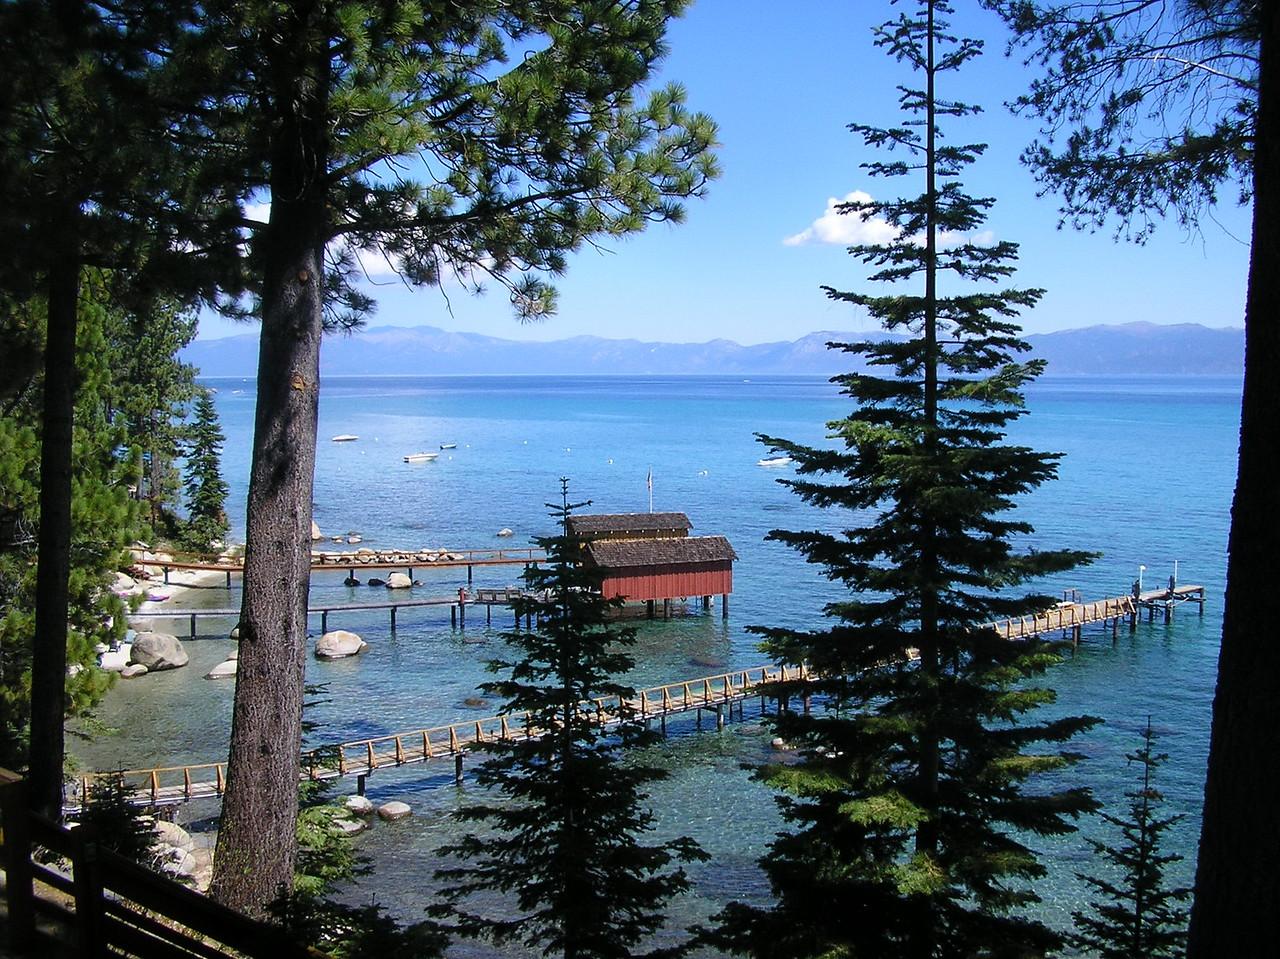 View of North Lake Tahoe